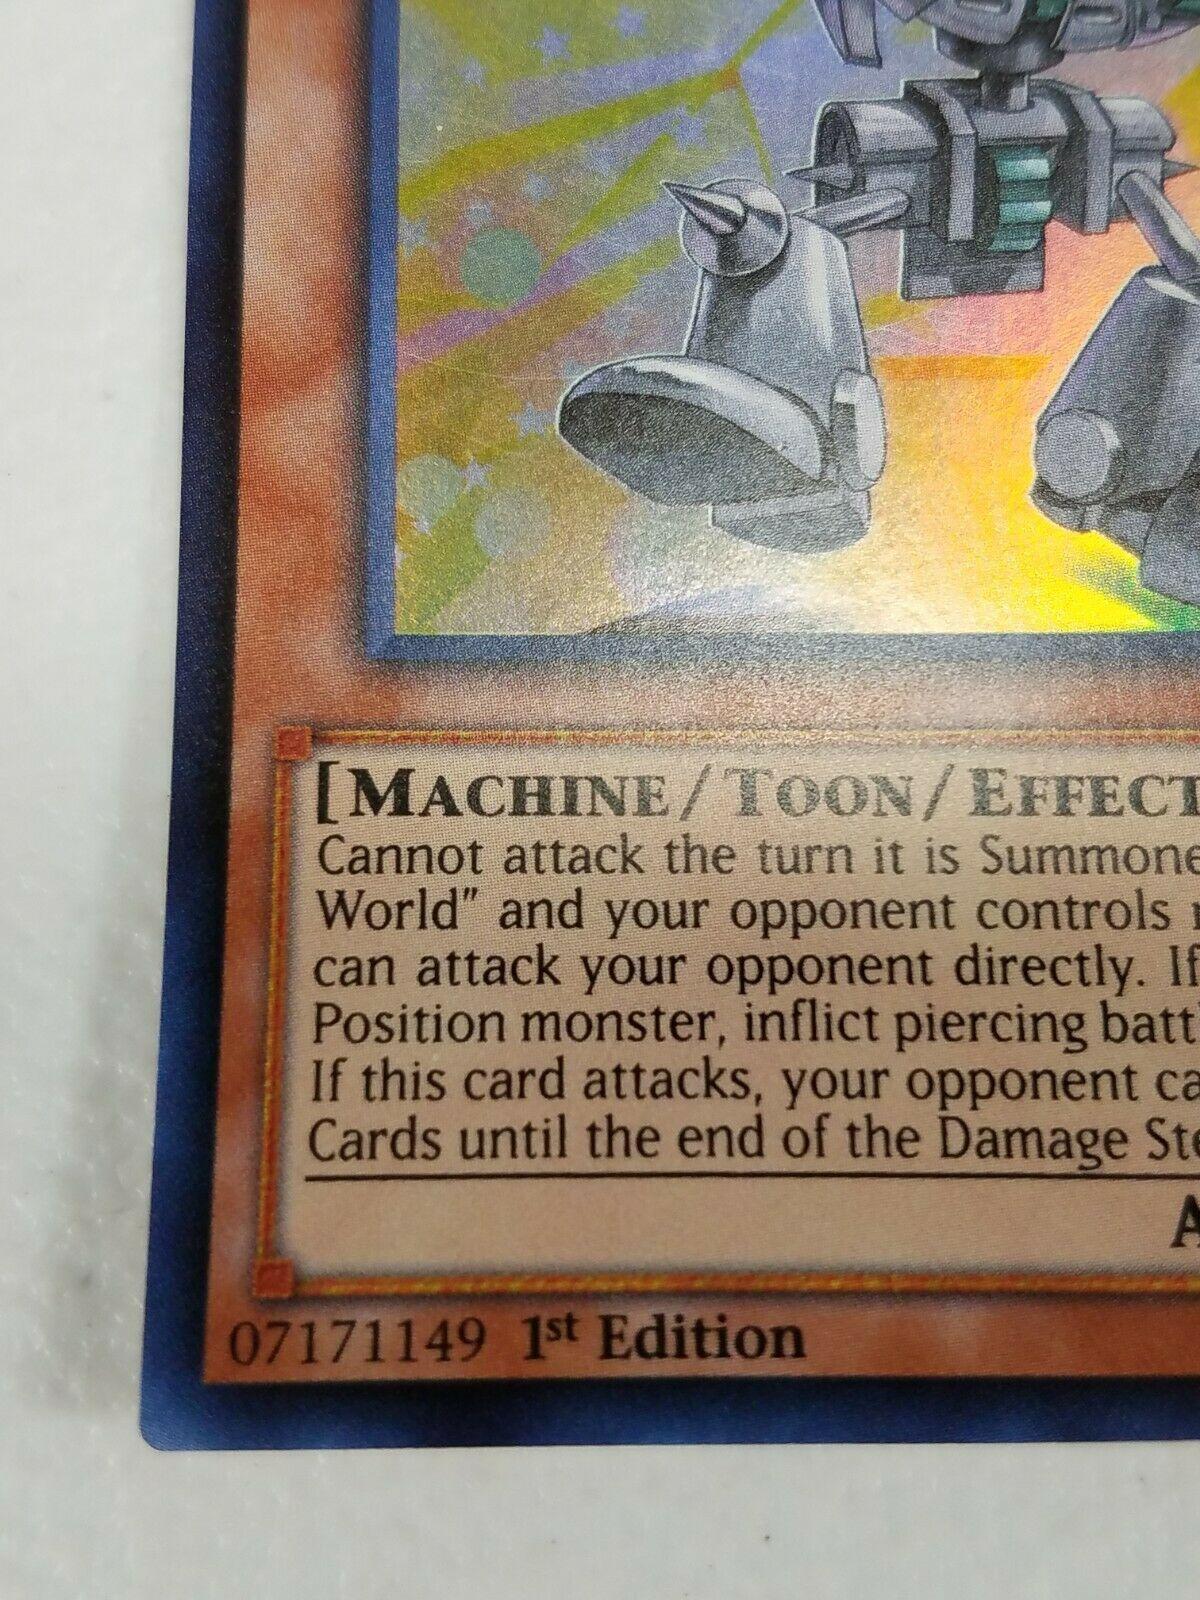 Yu-gi-oh! Trading Card Game - Toon Ancient Gear Golem - Super Rare - 1st Ed.